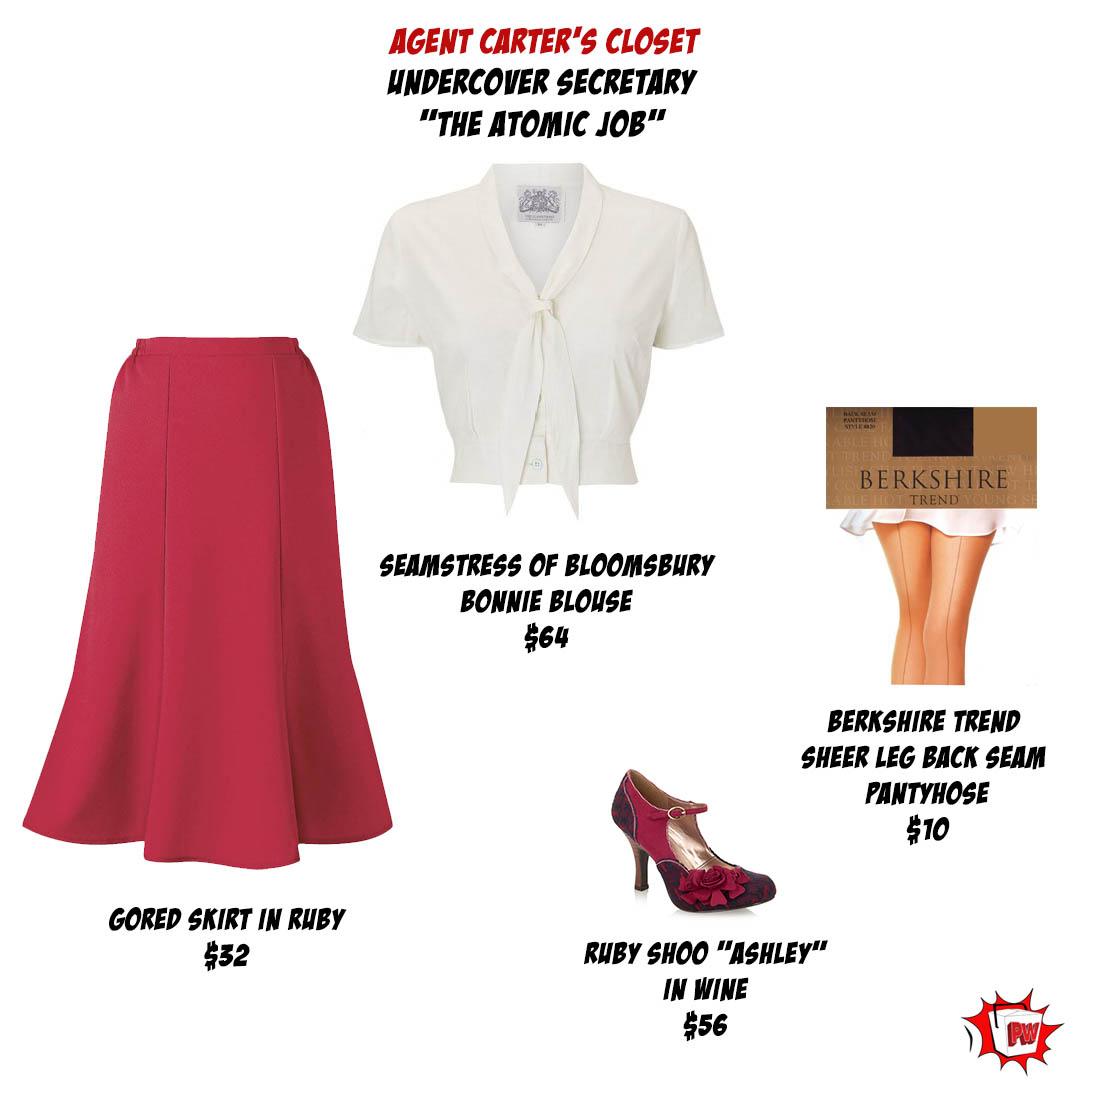 Agent Carter's Closet_UndercoverSec